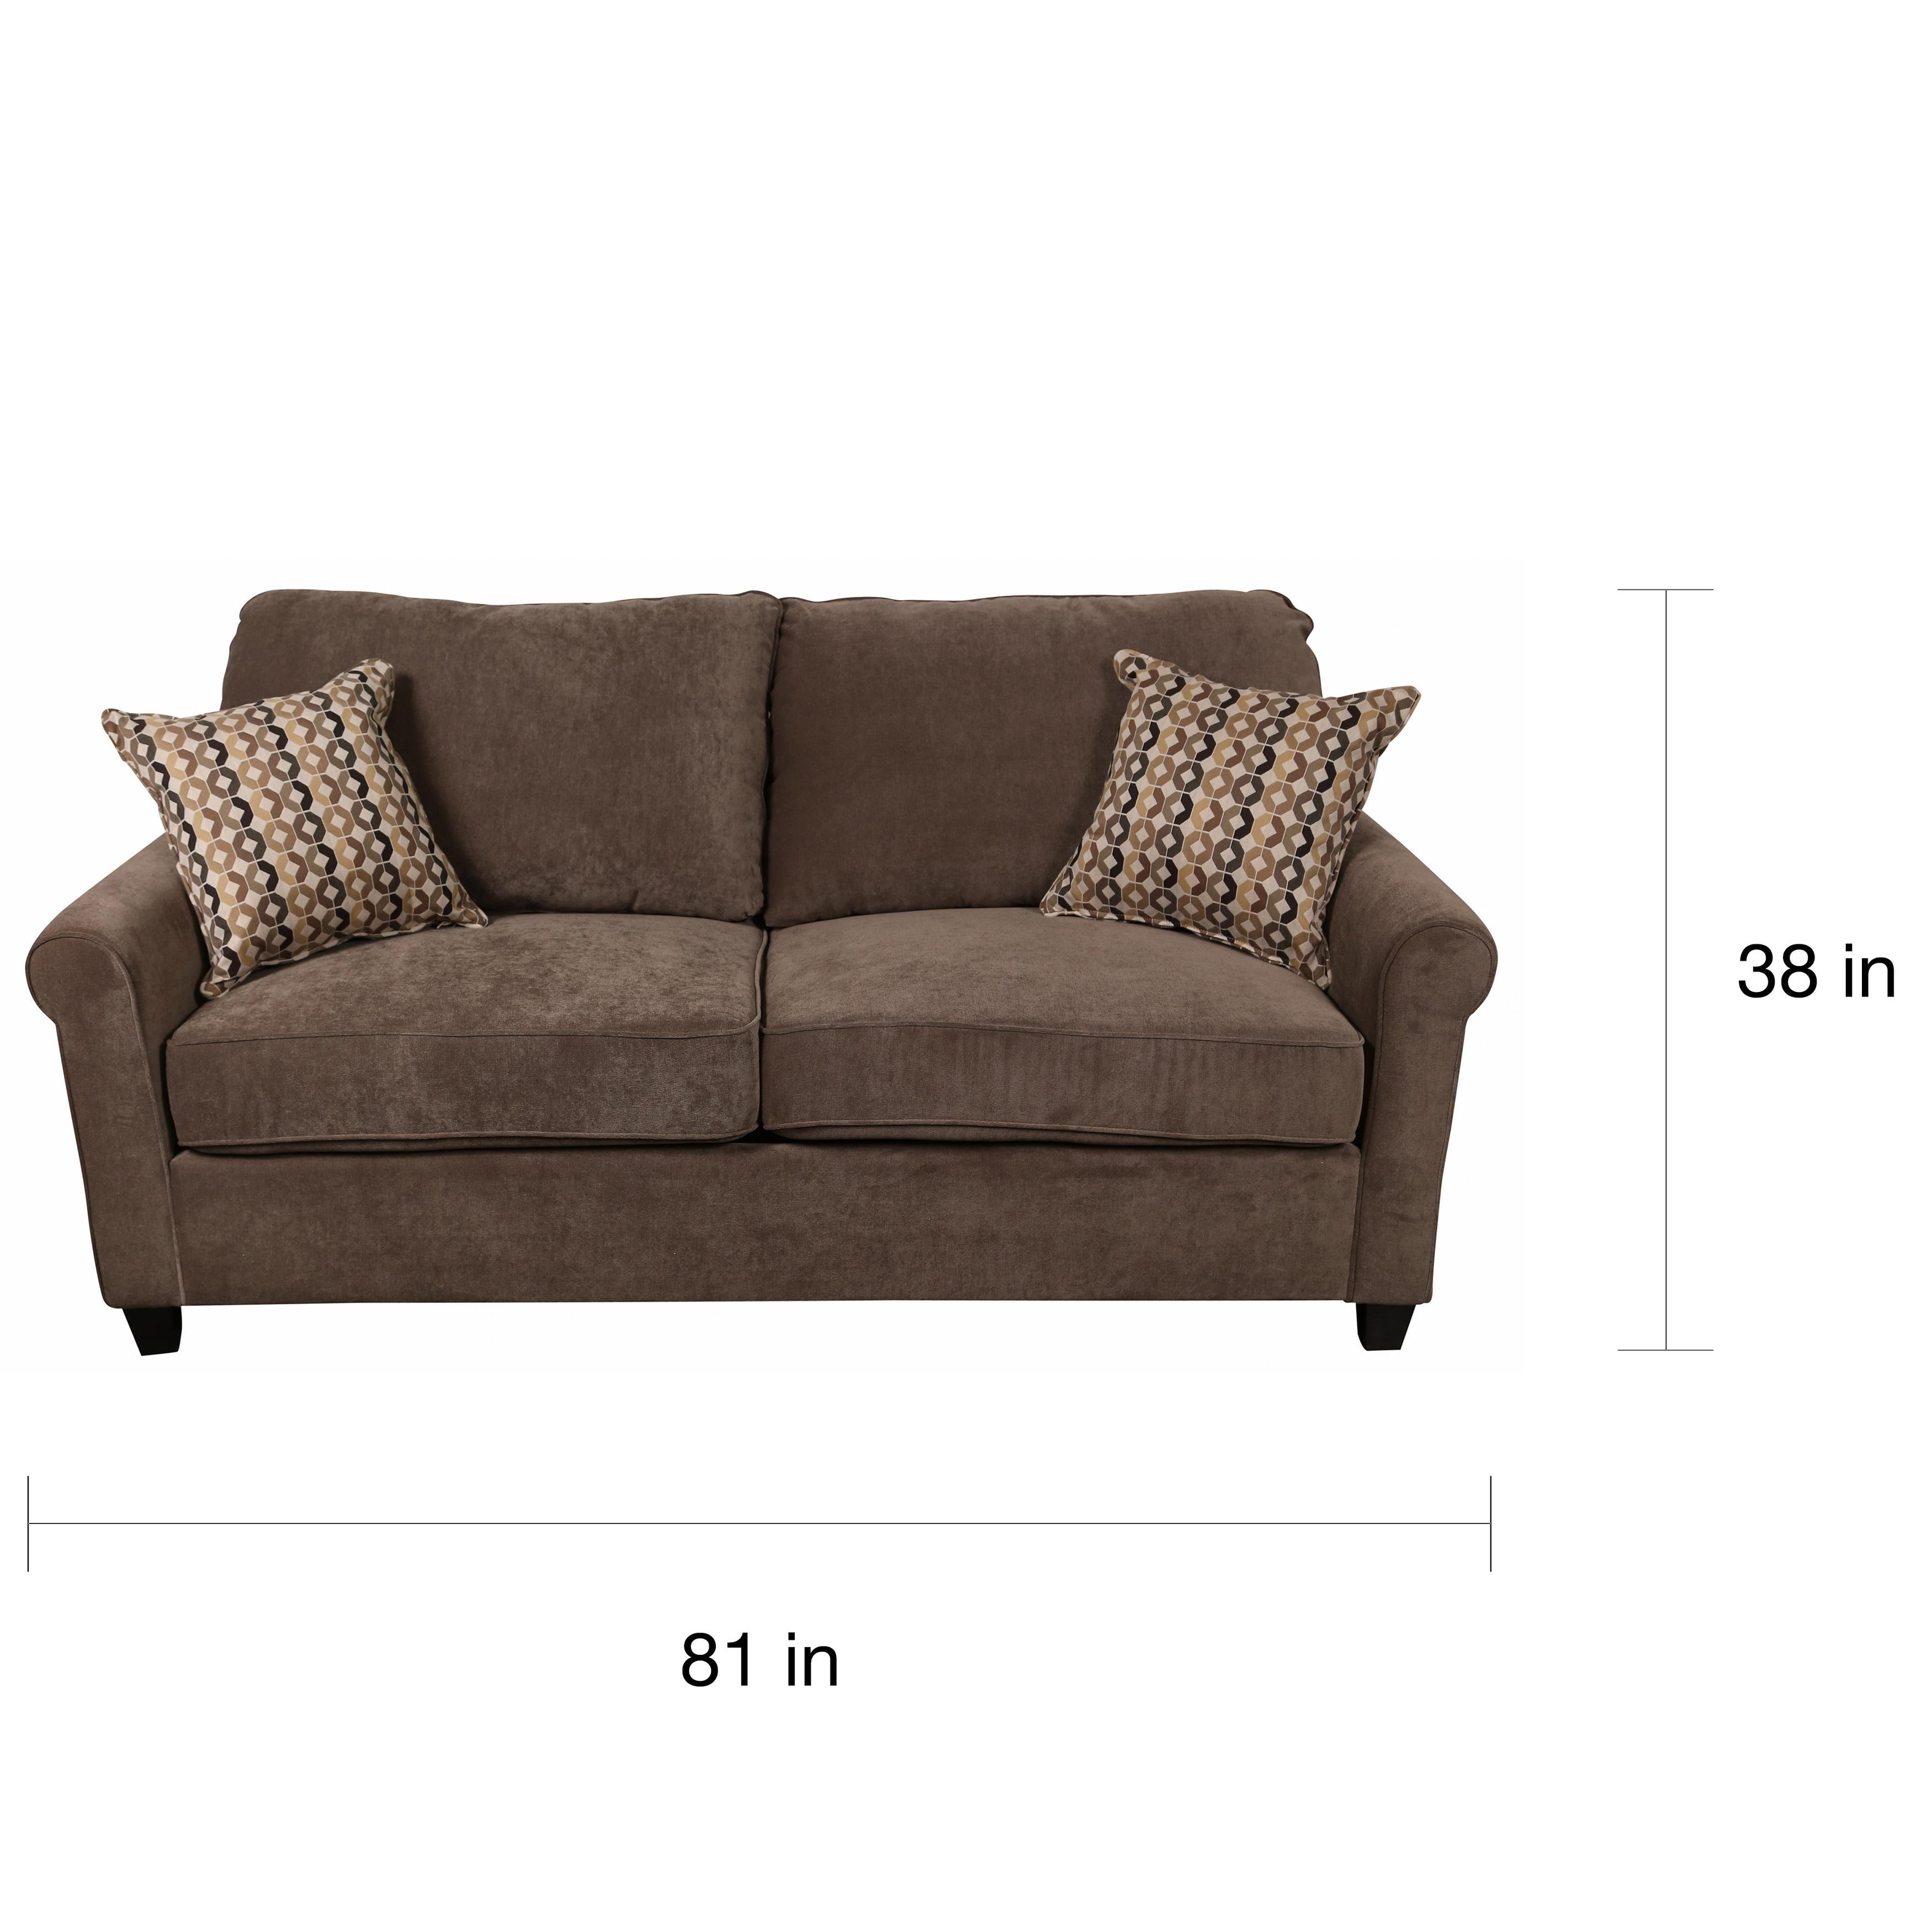 - Shop Porter Serena Warm Grey Microfiber Queen Sleeper Sofa With